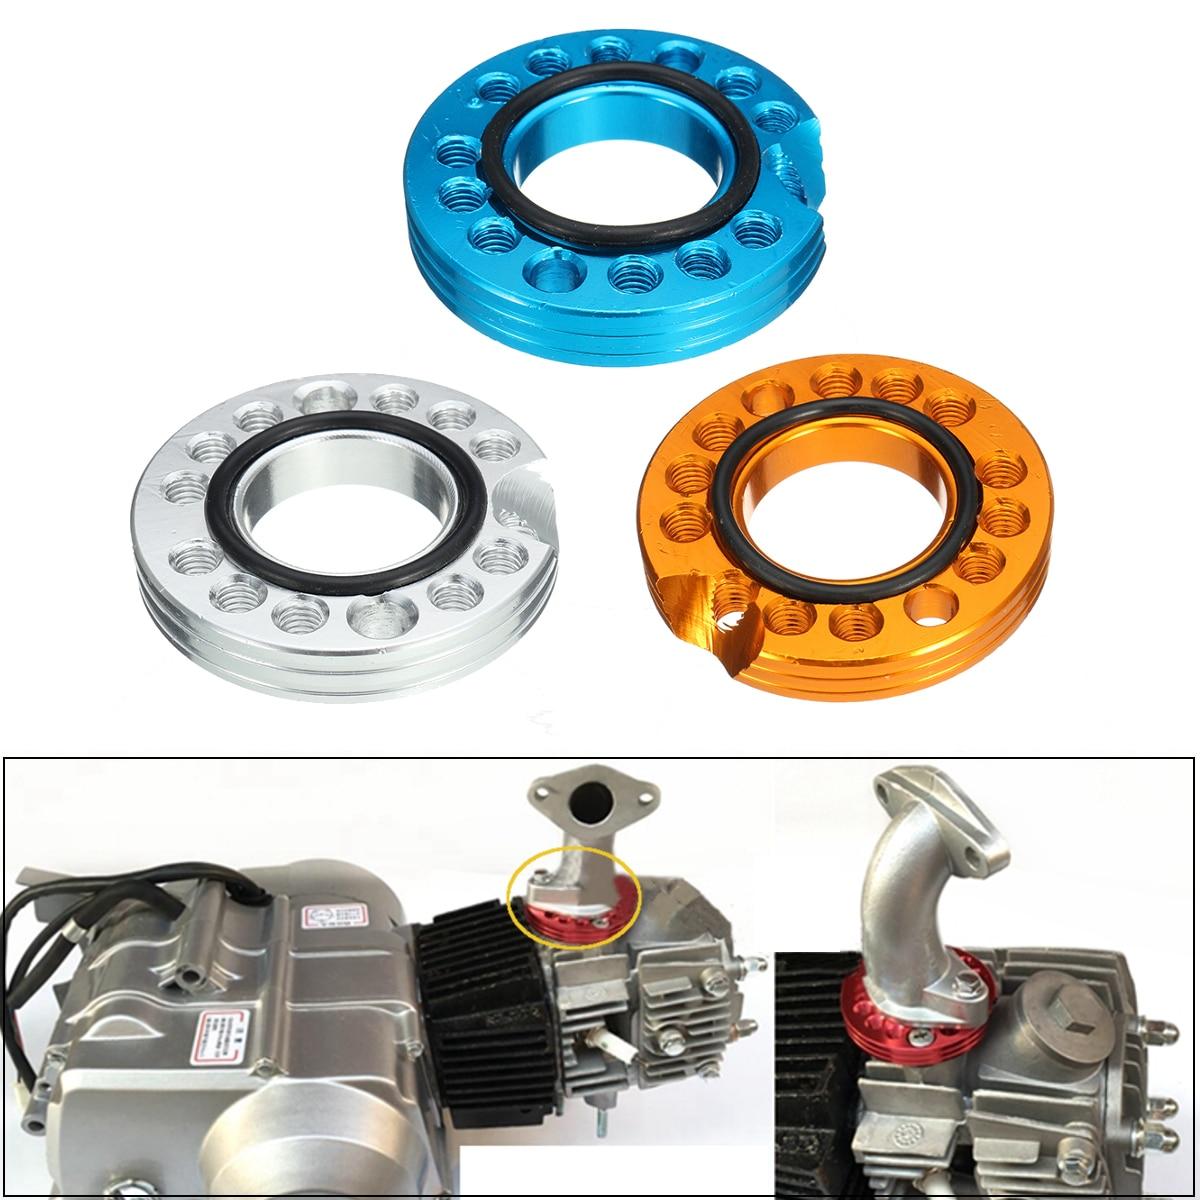 28mm CNC Carb Adjuster Carburetor Inlet Manifold Spinner Plate For Pit Dirt Bike ATV 90cc 110cc 125cc